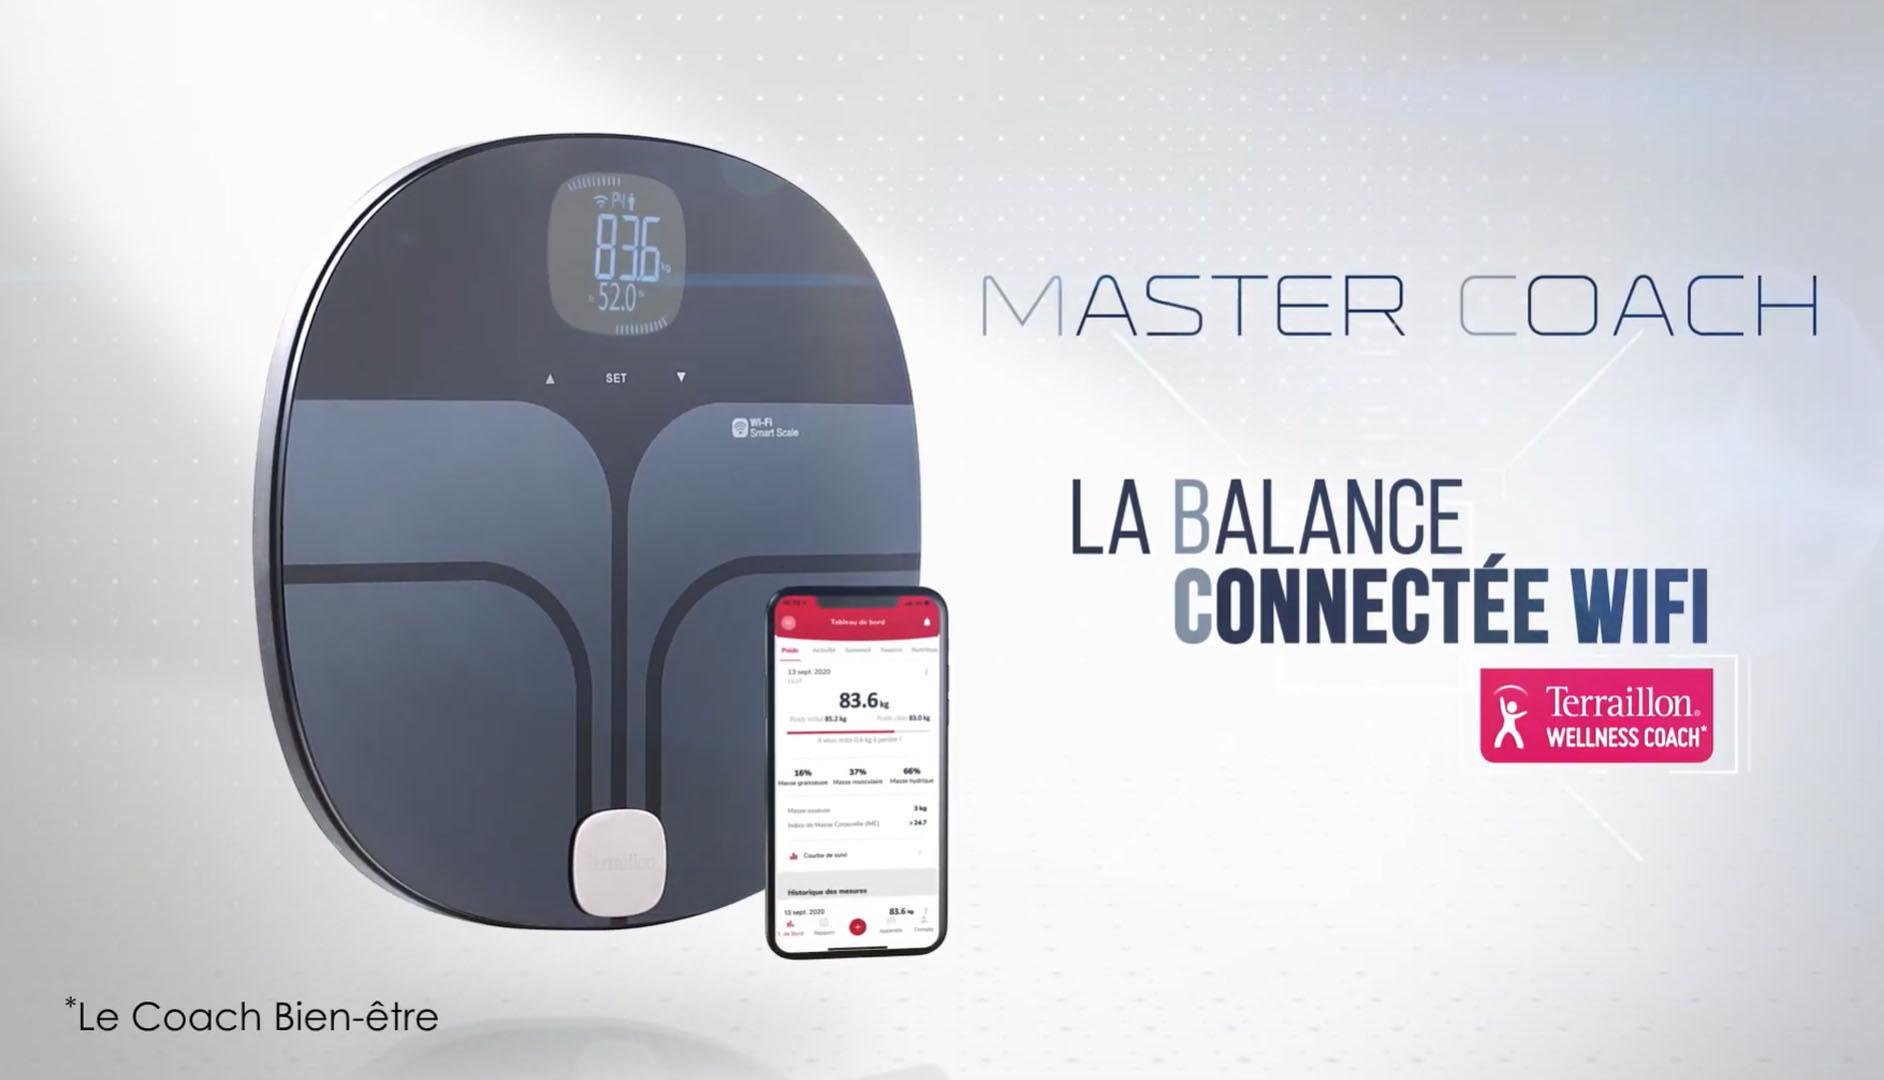 MASTER COACH - La Balance Wi-Fi Connectée